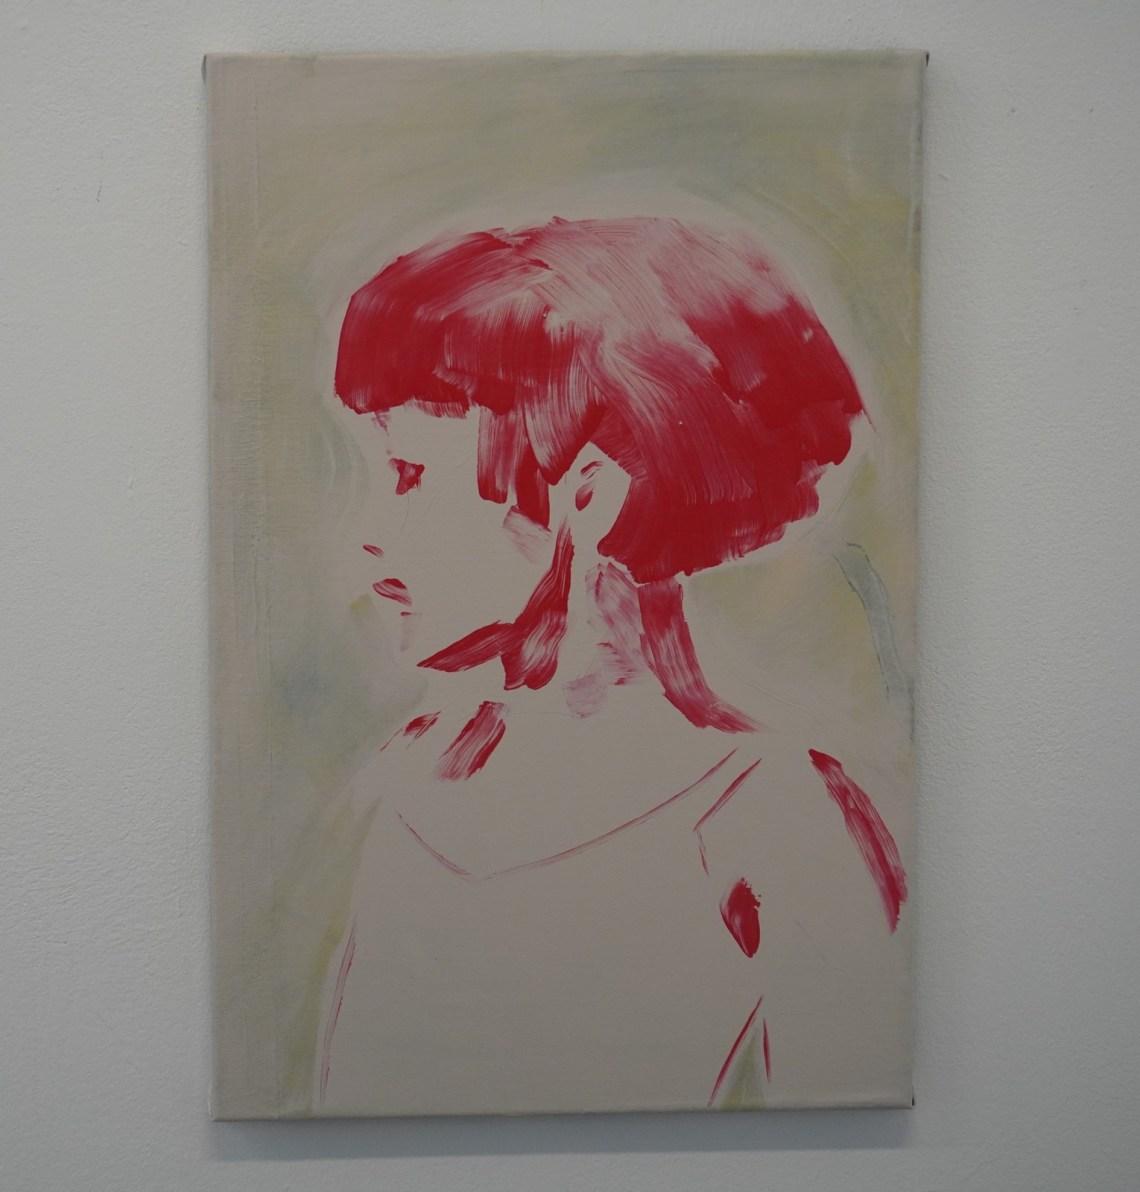 Veronika Petuchova